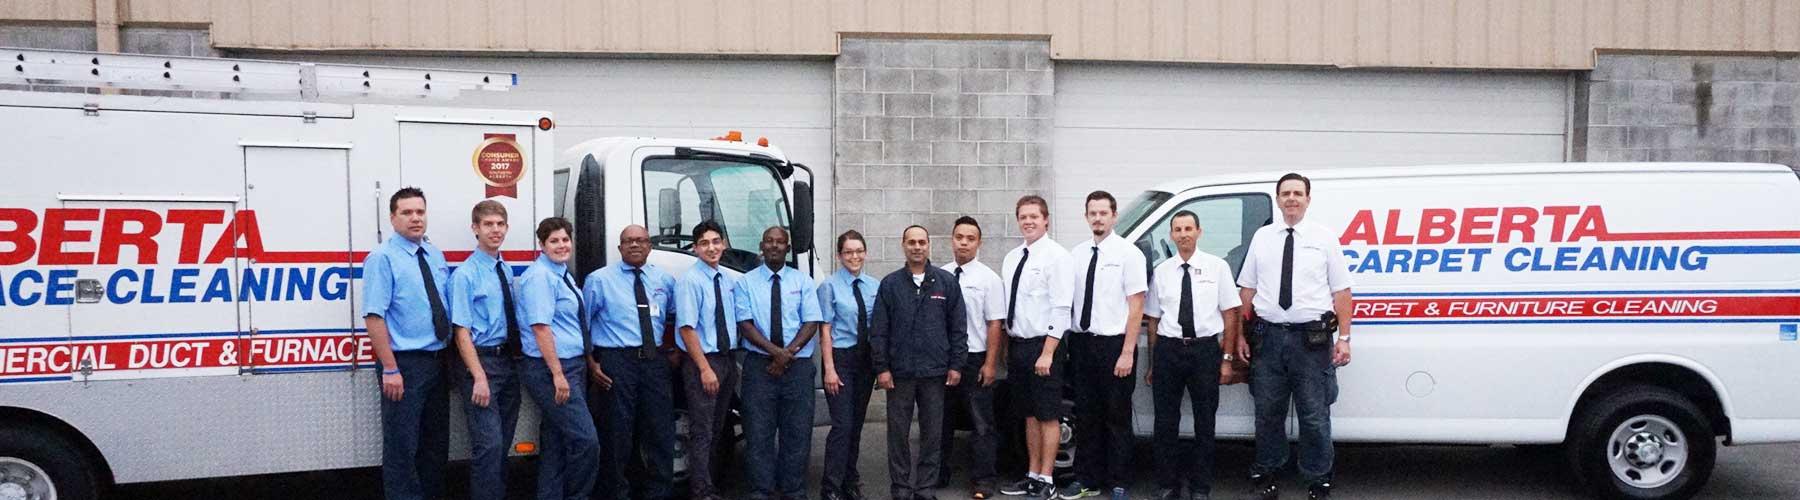 Alberta Home Services Crew